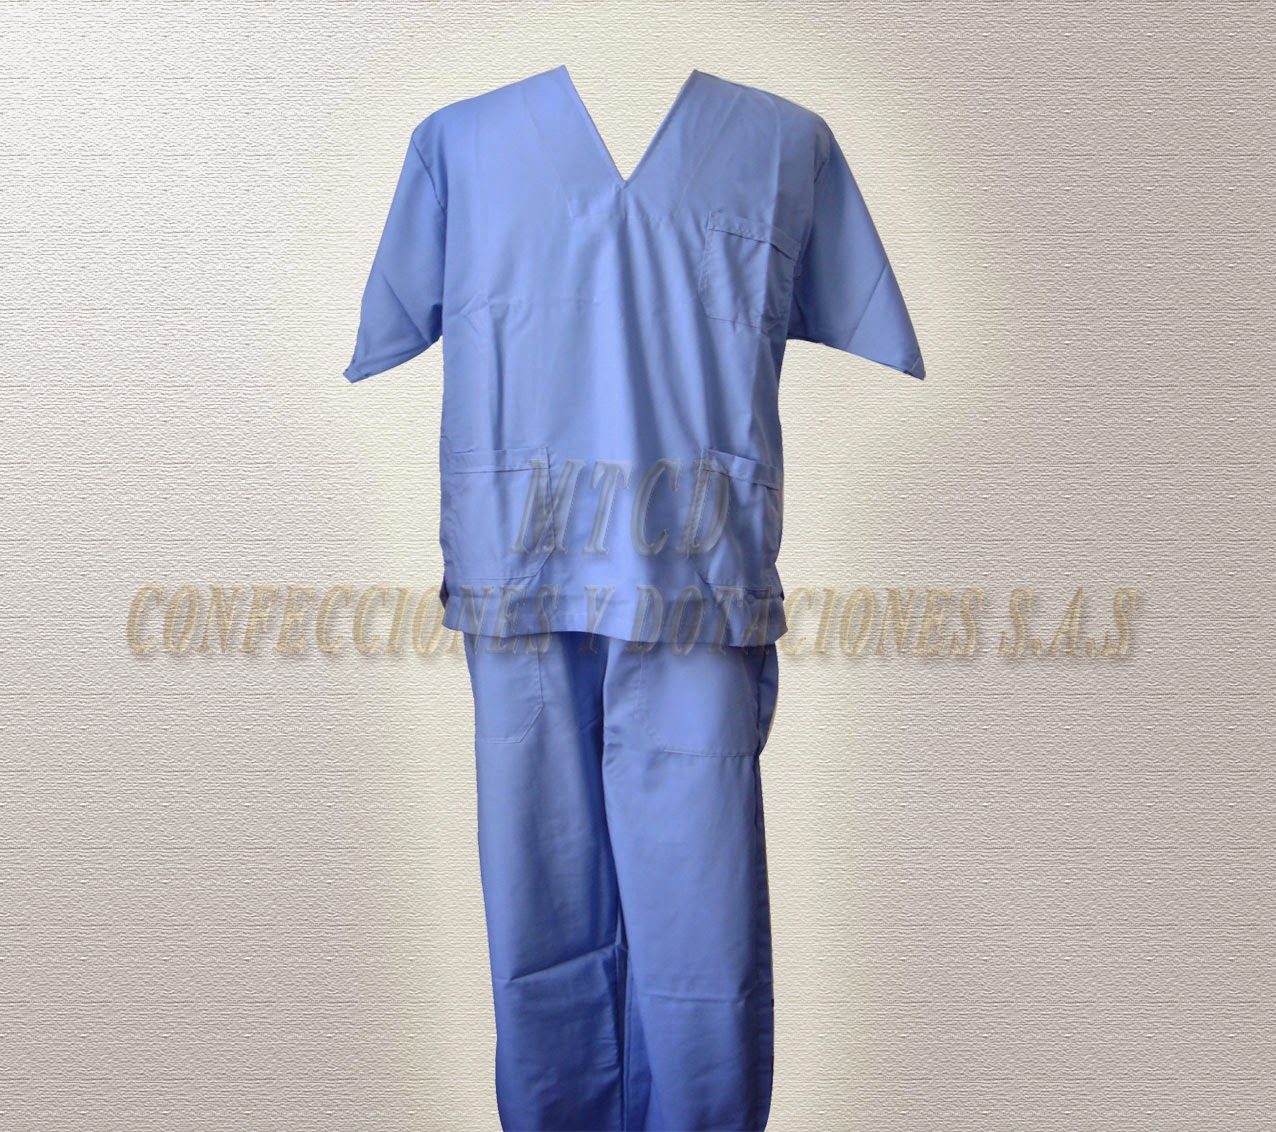 Fabrica de uniformes en bogota